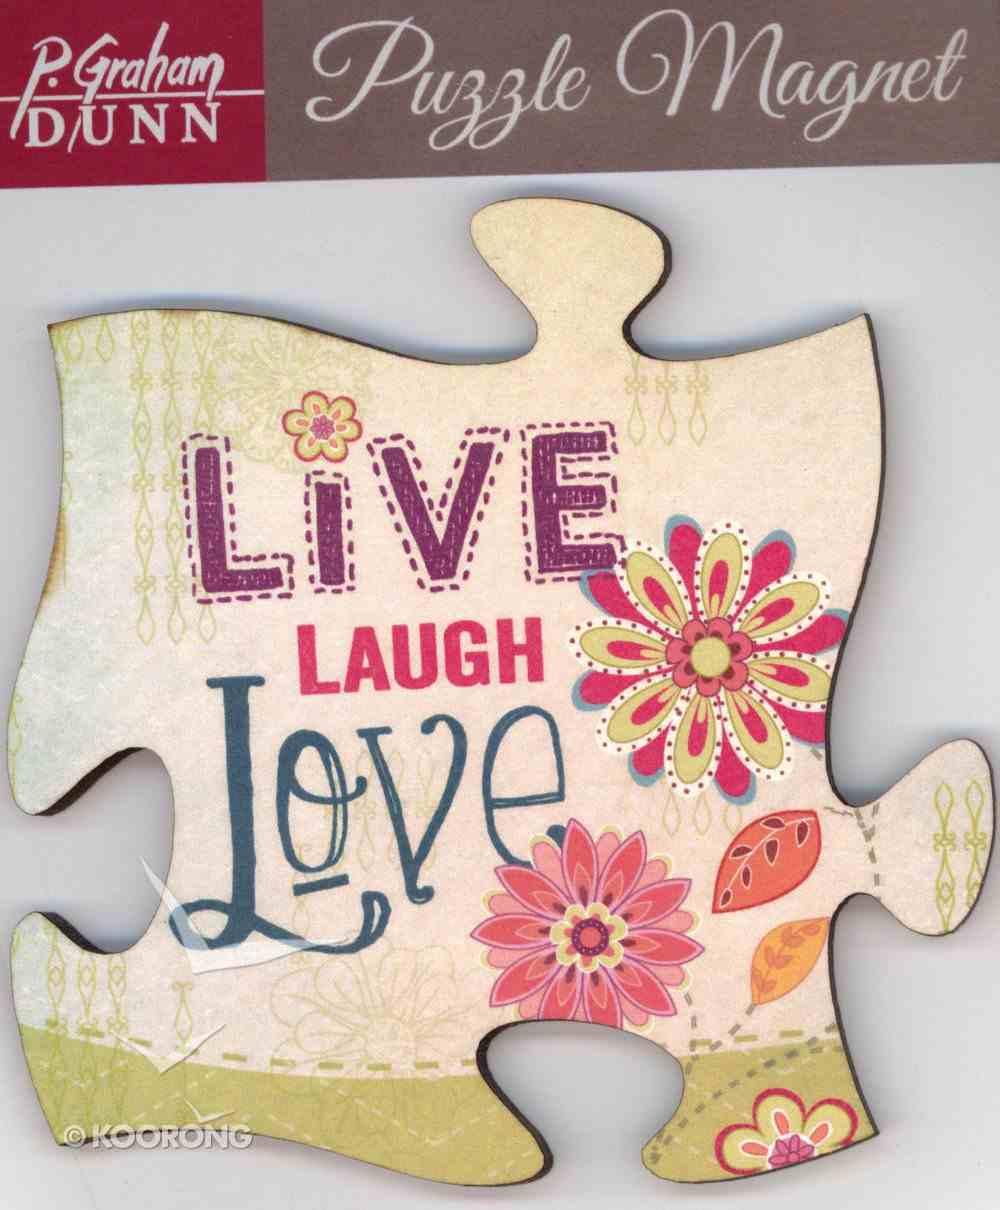 Puzzle Magnets: Live, Laugh, Love Novelty